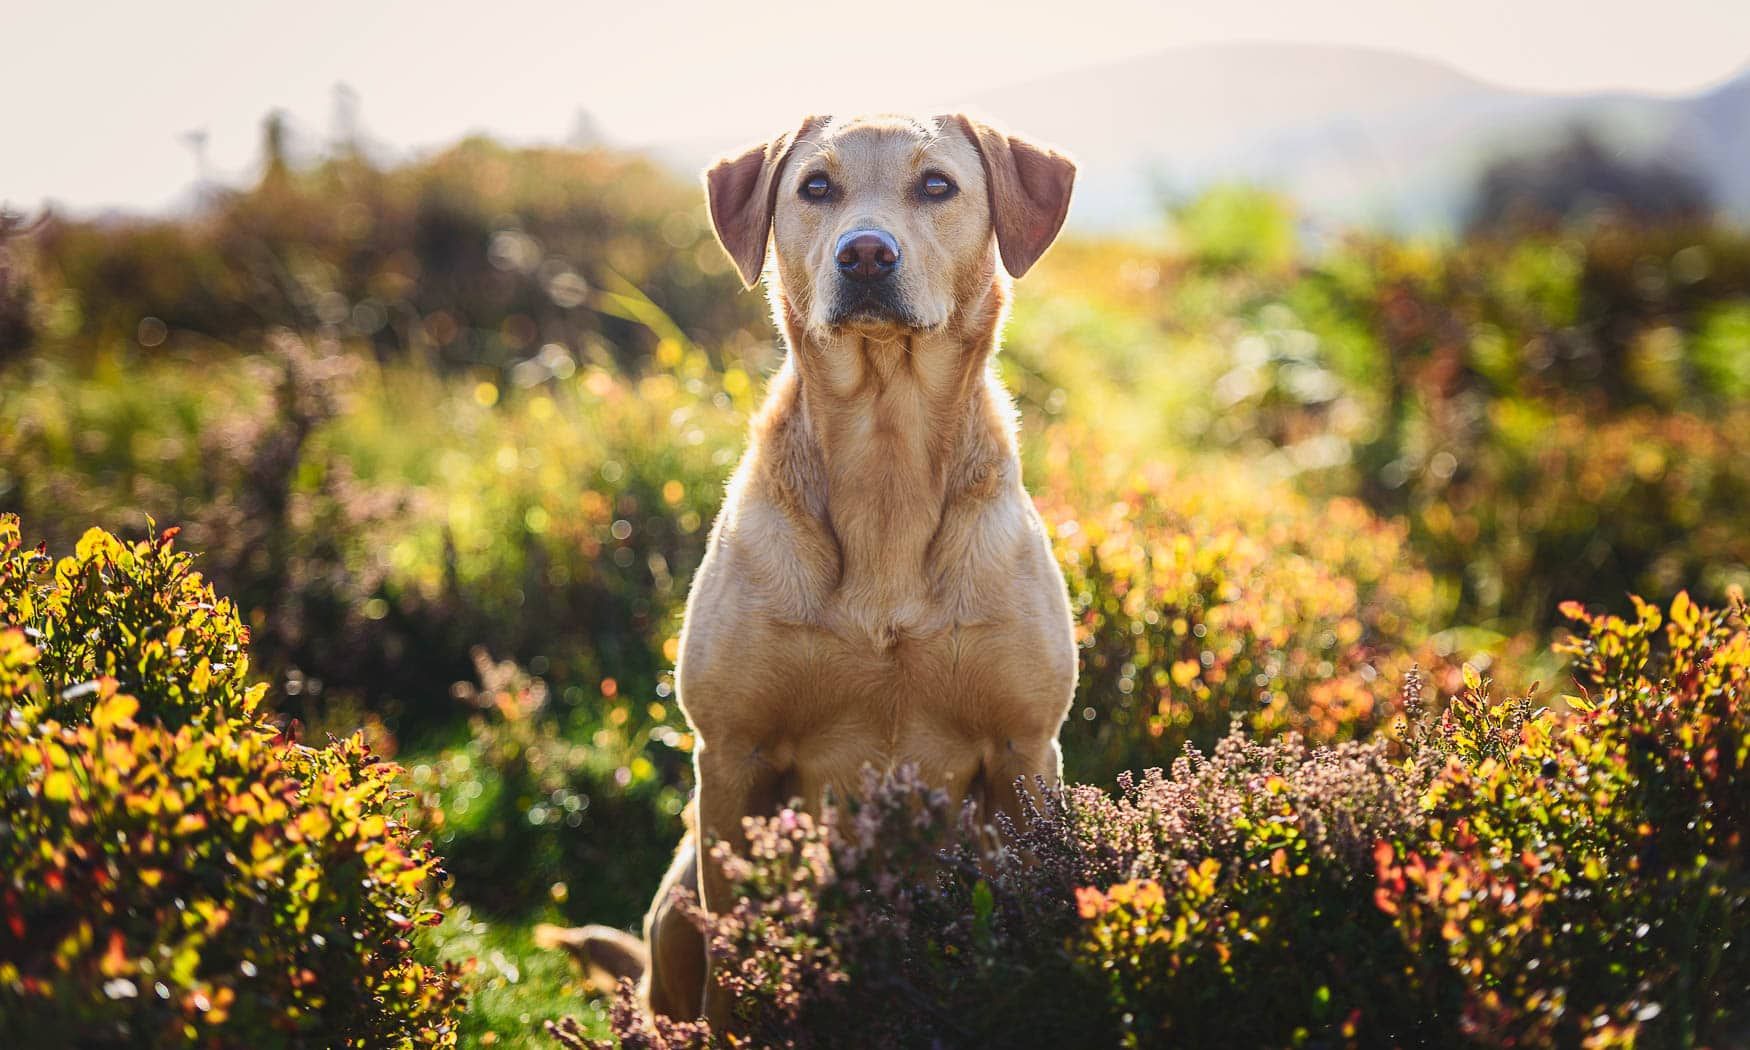 Wrexham Dog Photographer - Working Fox Red Labrador